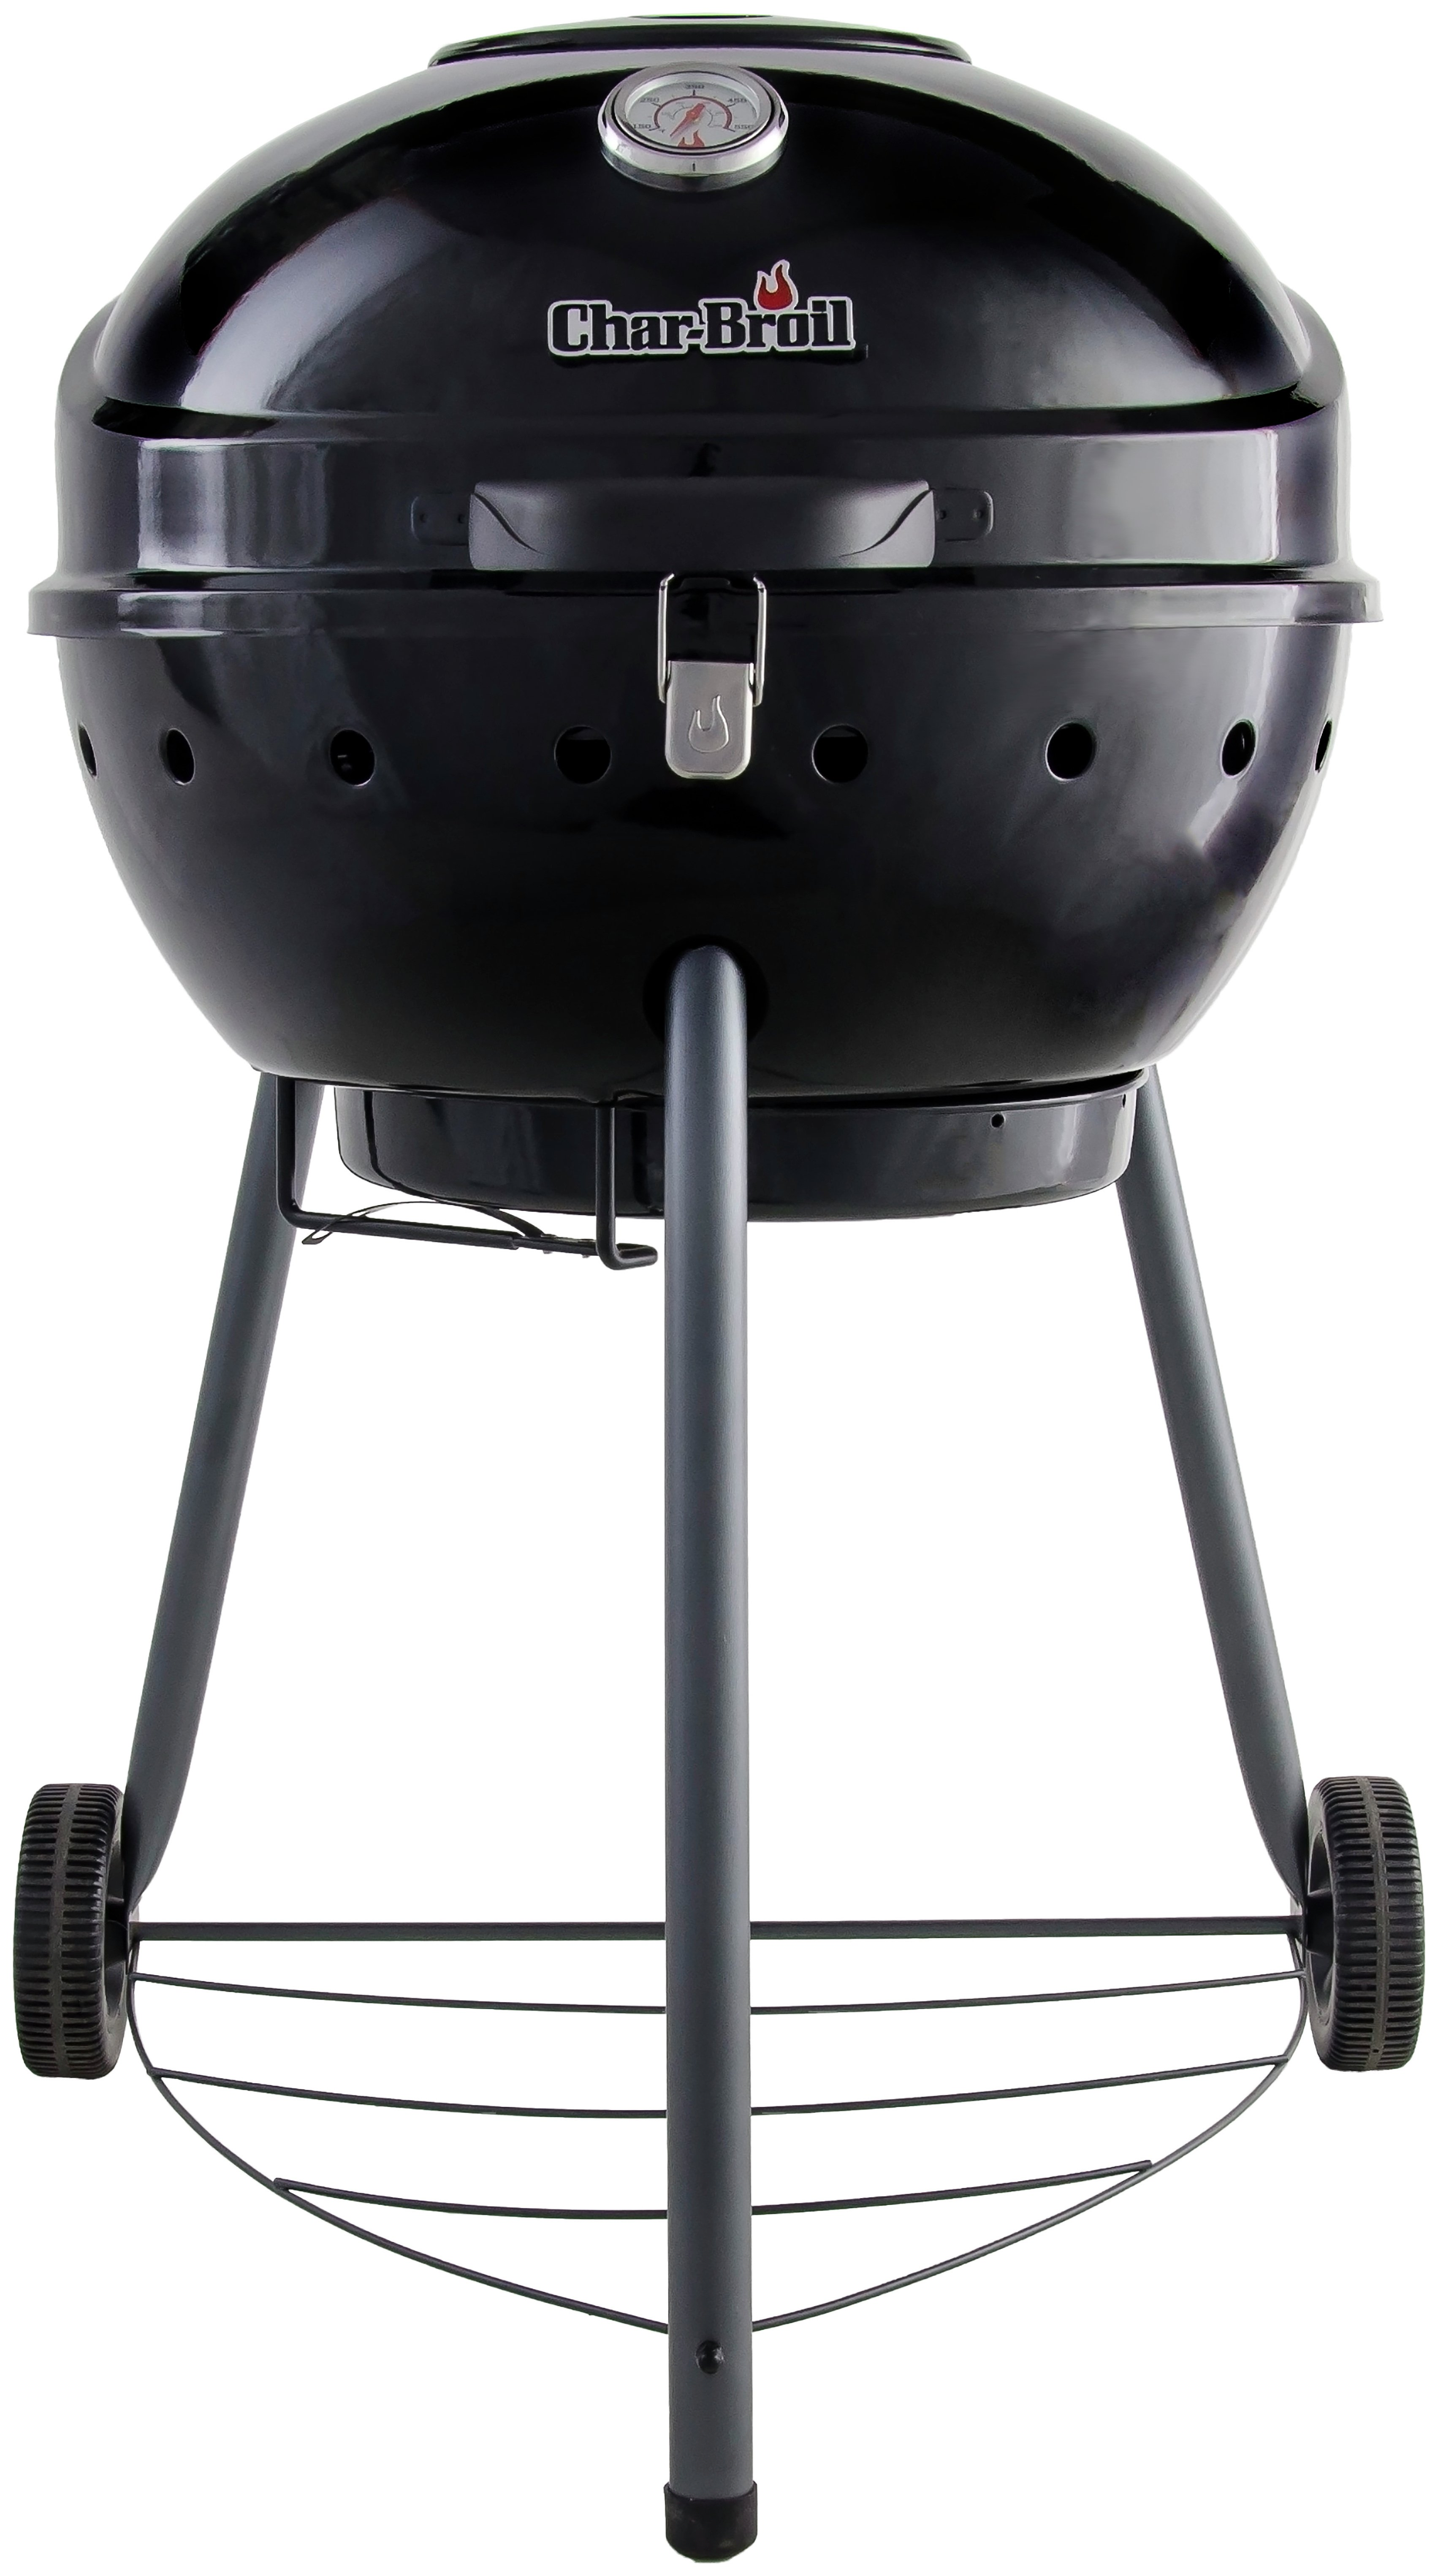 Char-Broil Kettleman Charcoal BBQ